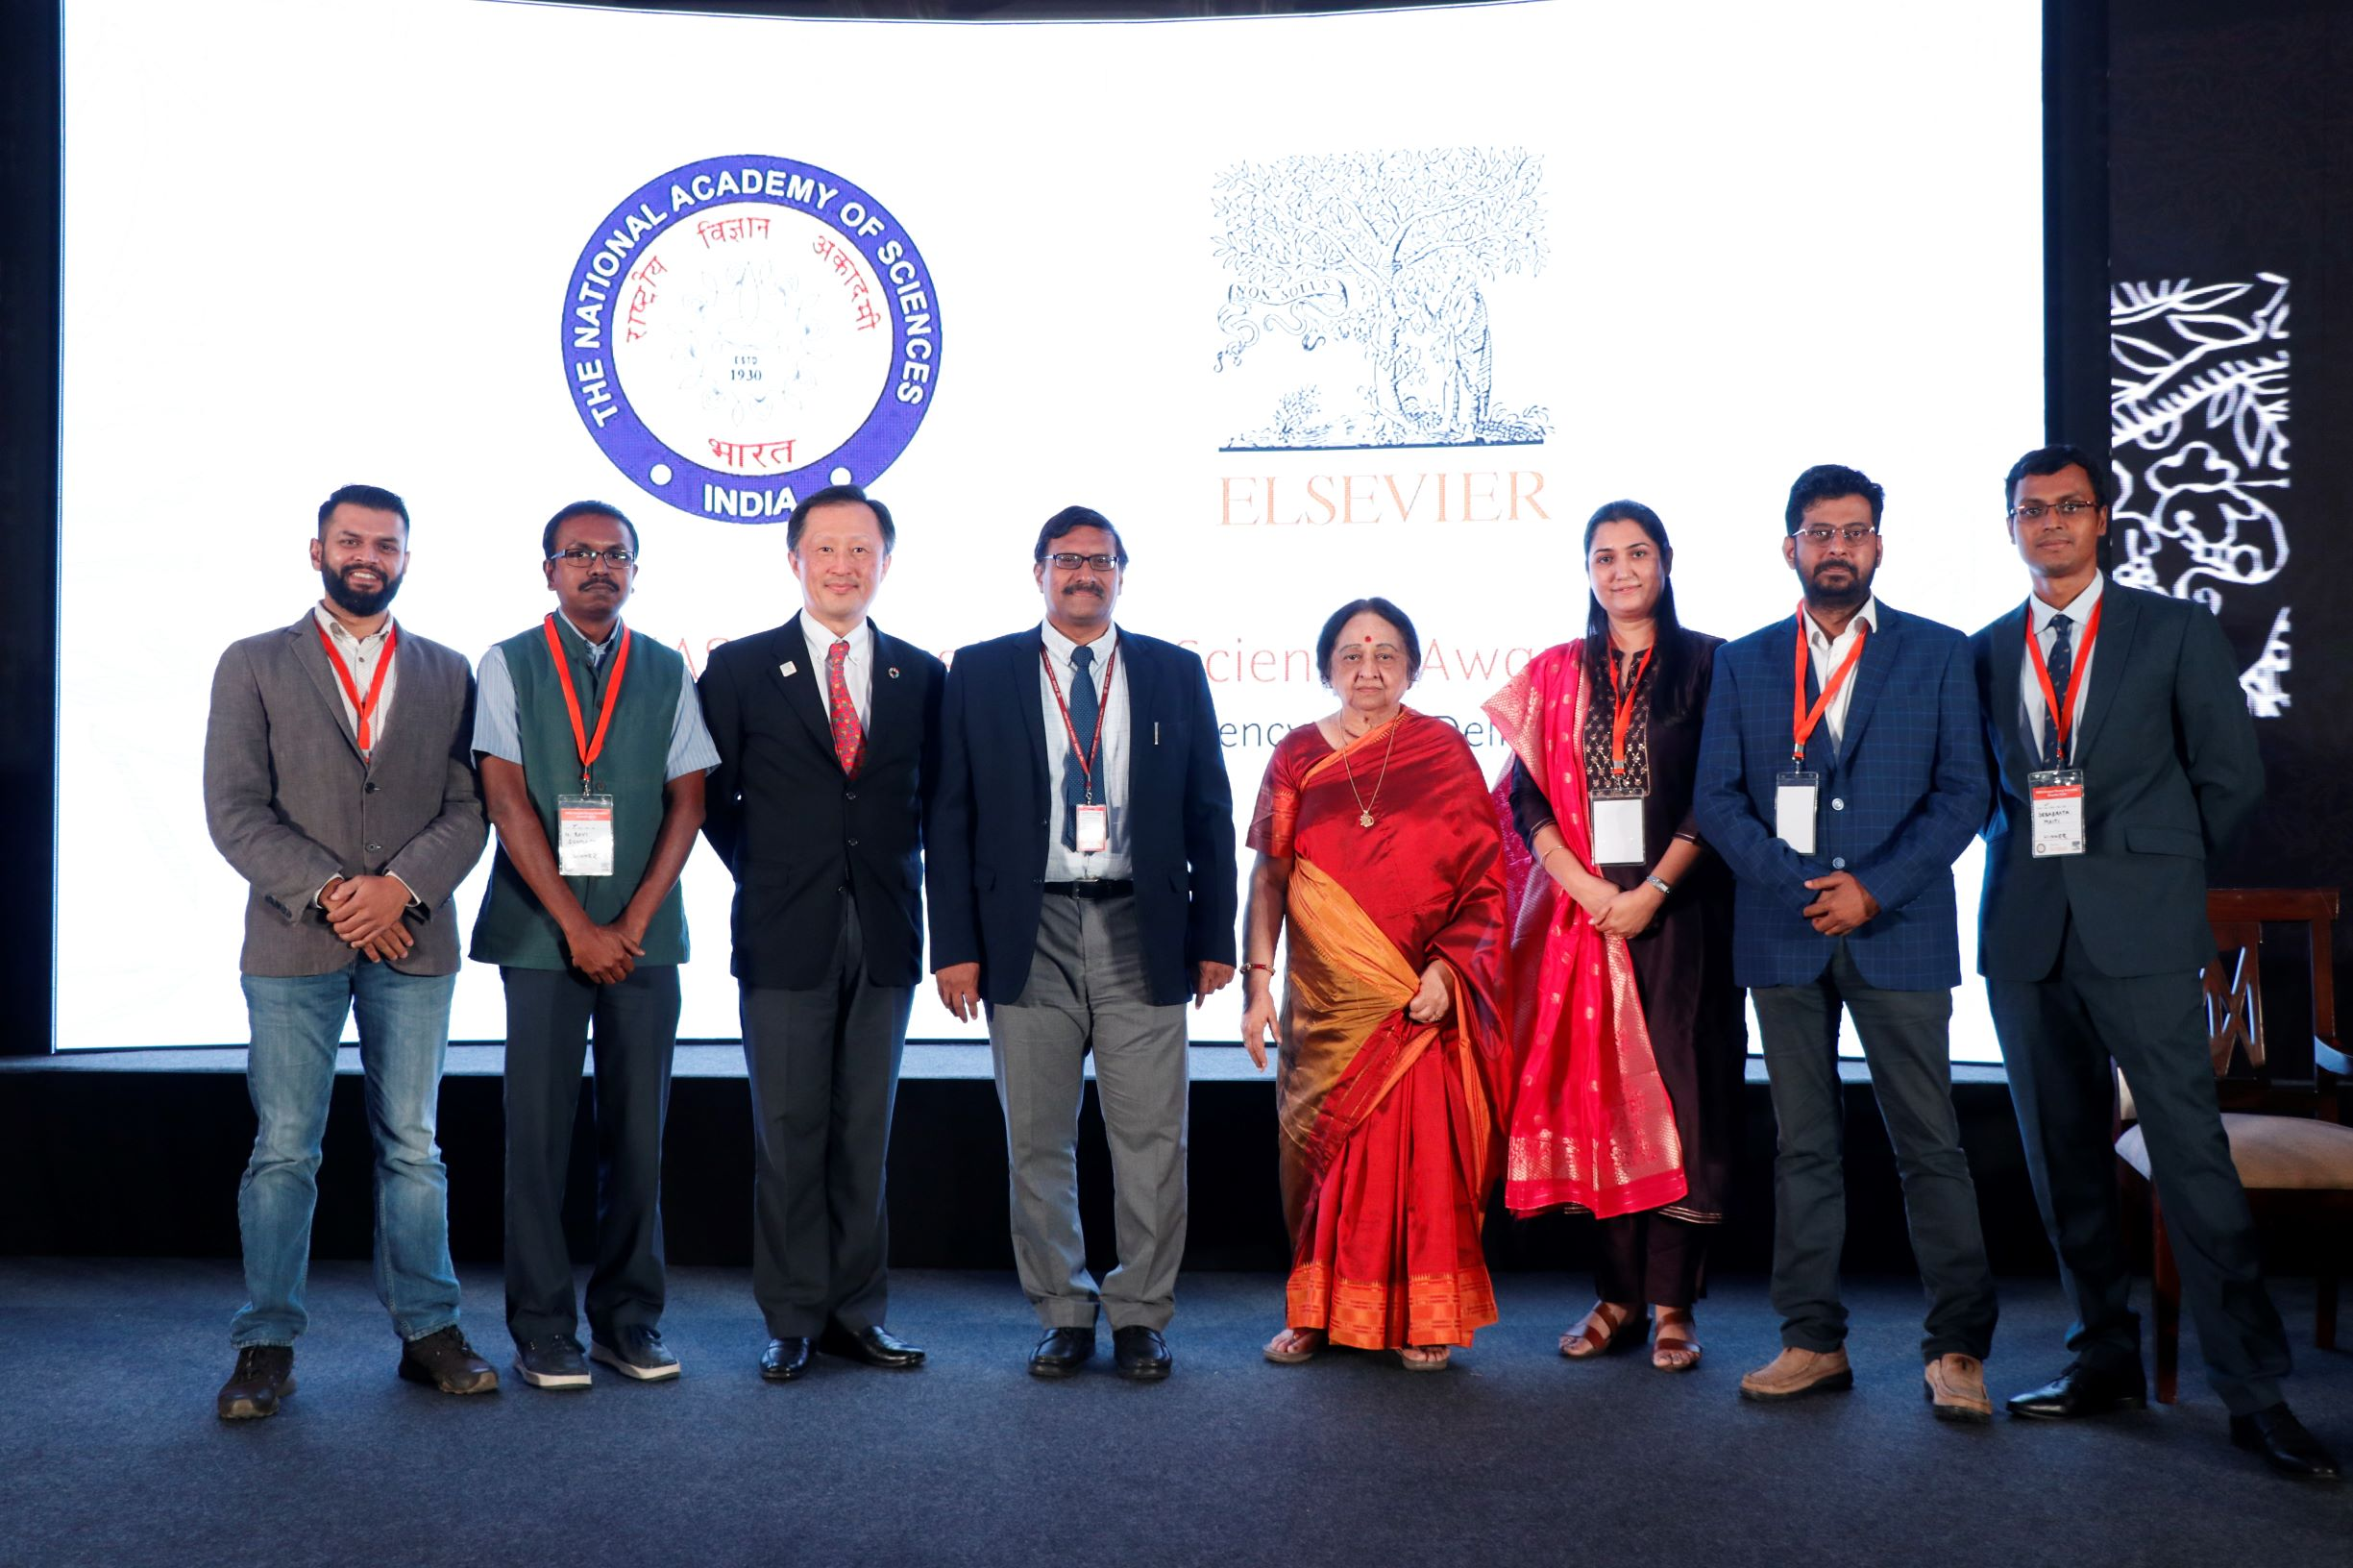 2019 NASI SCOPUS YOUNG SCIENTIST AWARDS WINNERS